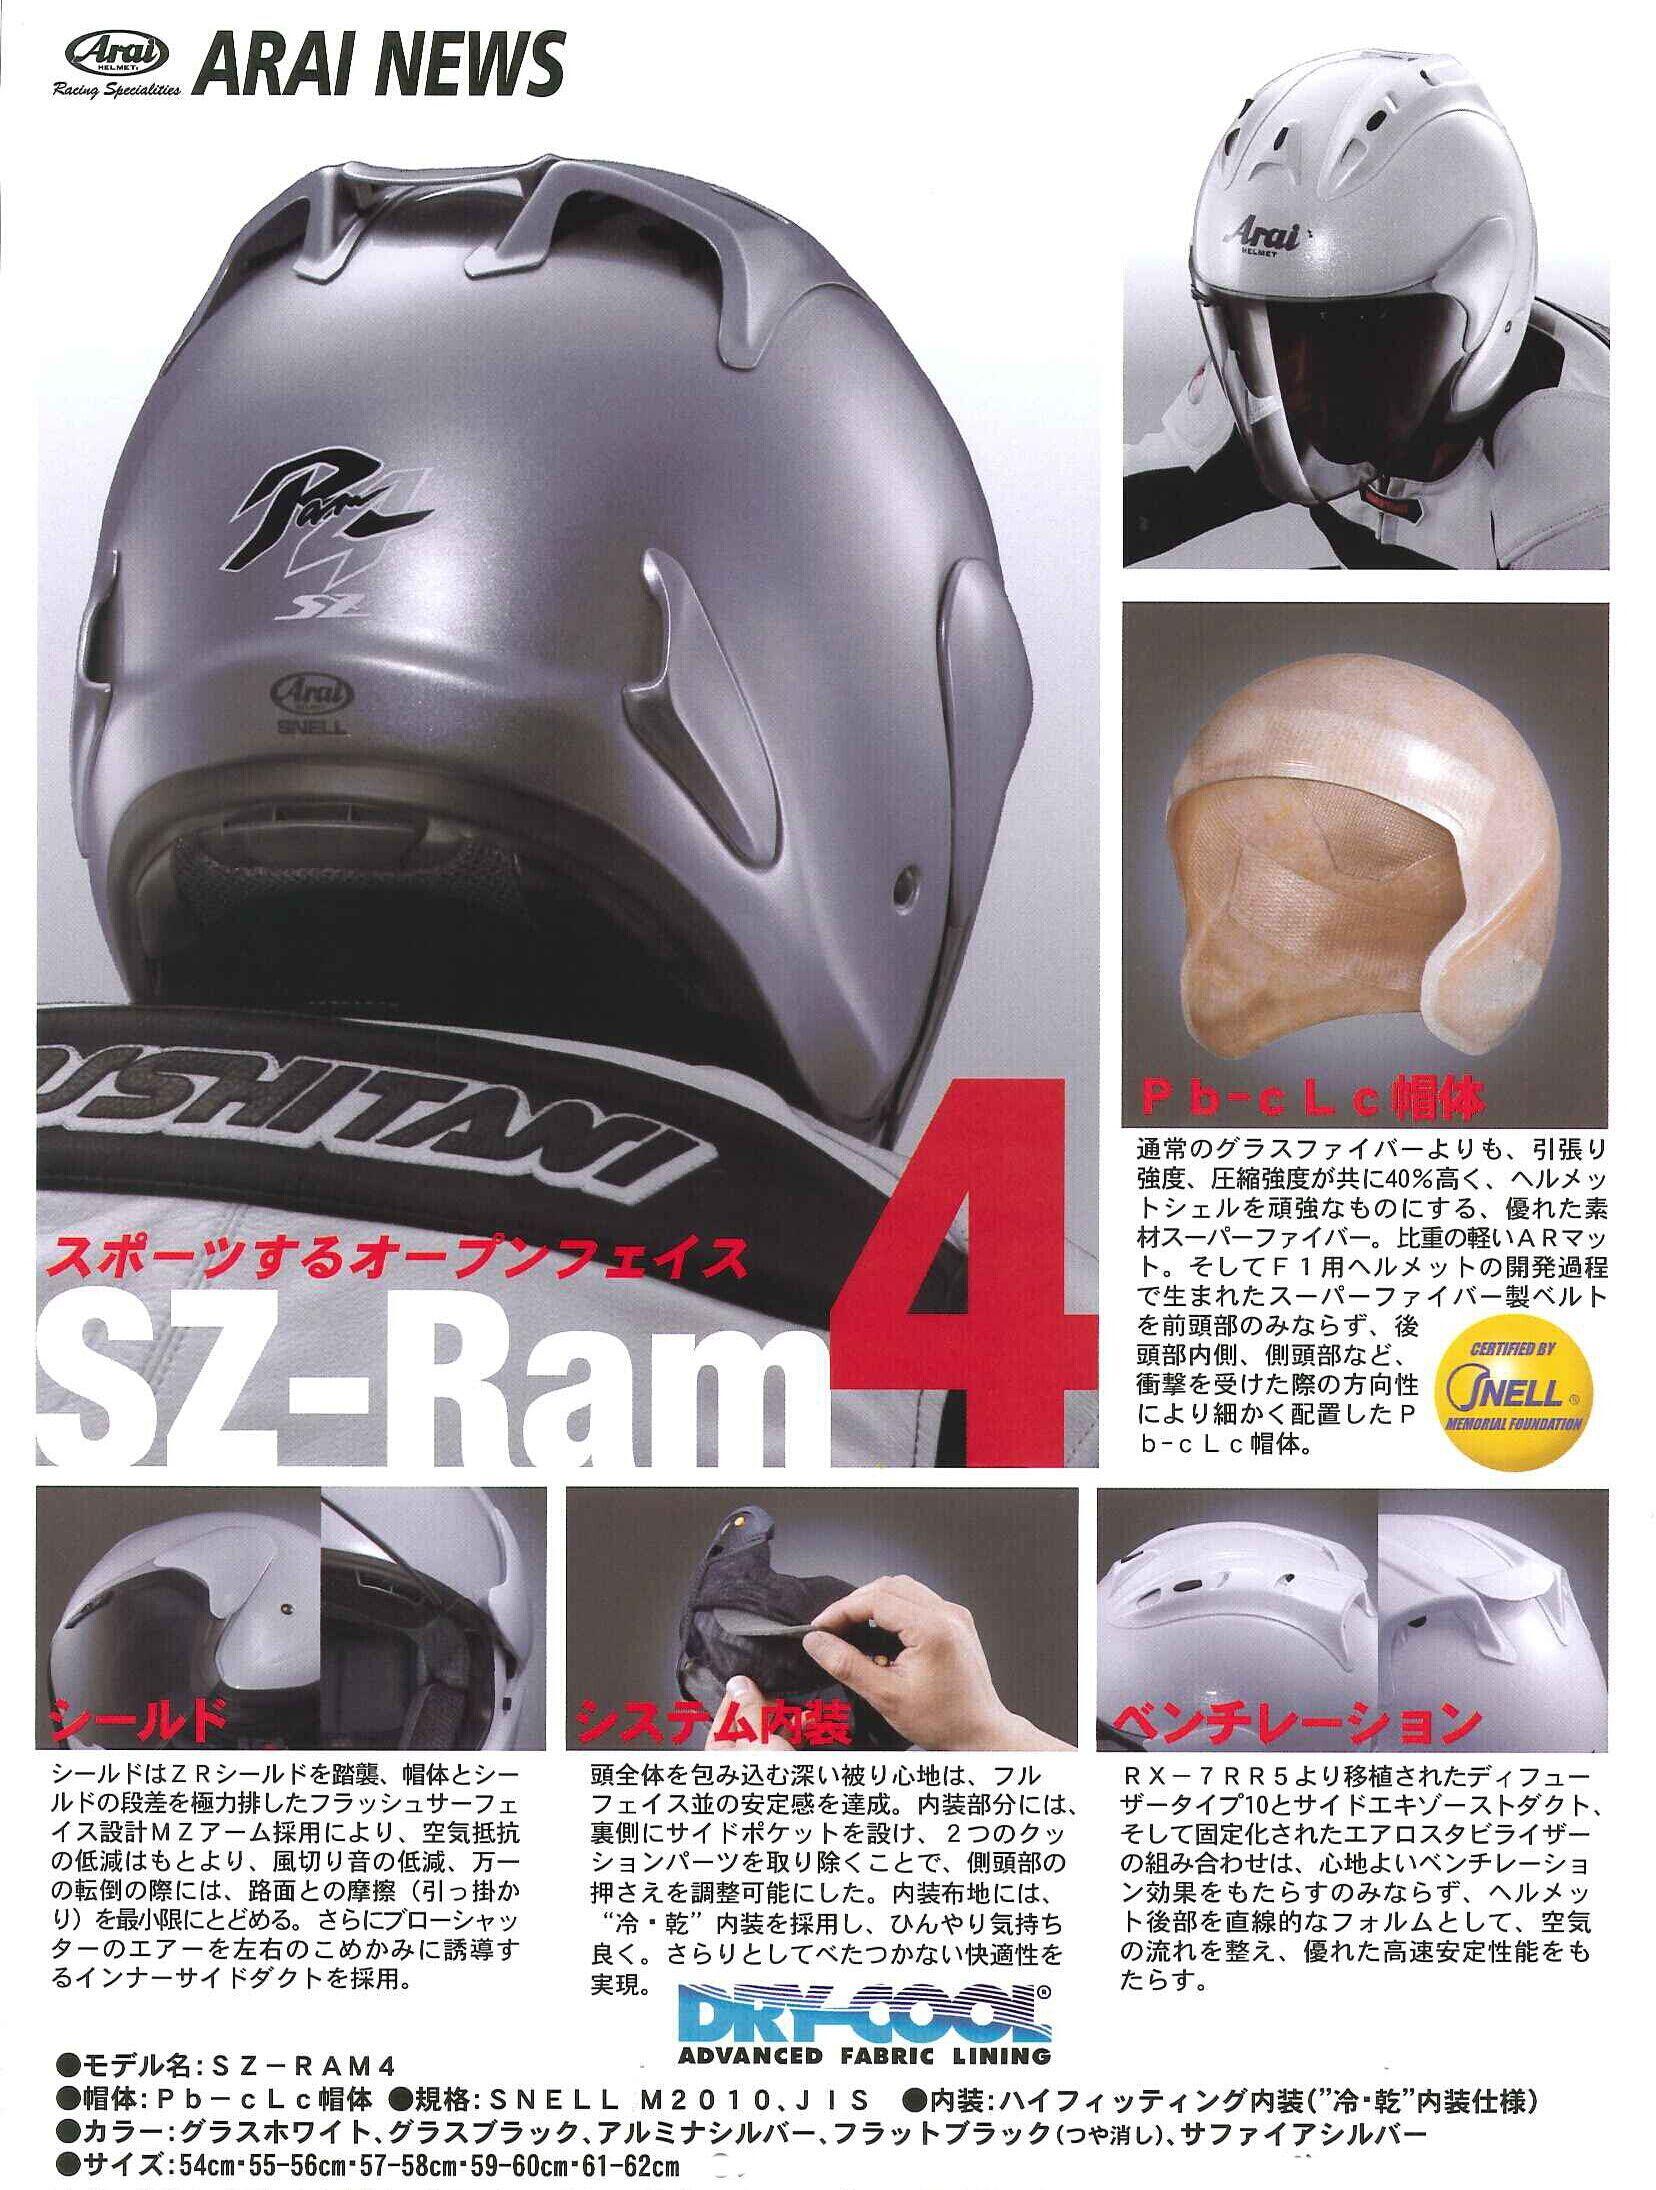 【Arai】SZ-RAM4 STOUT 安全帽 - 「Webike-摩托百貨」